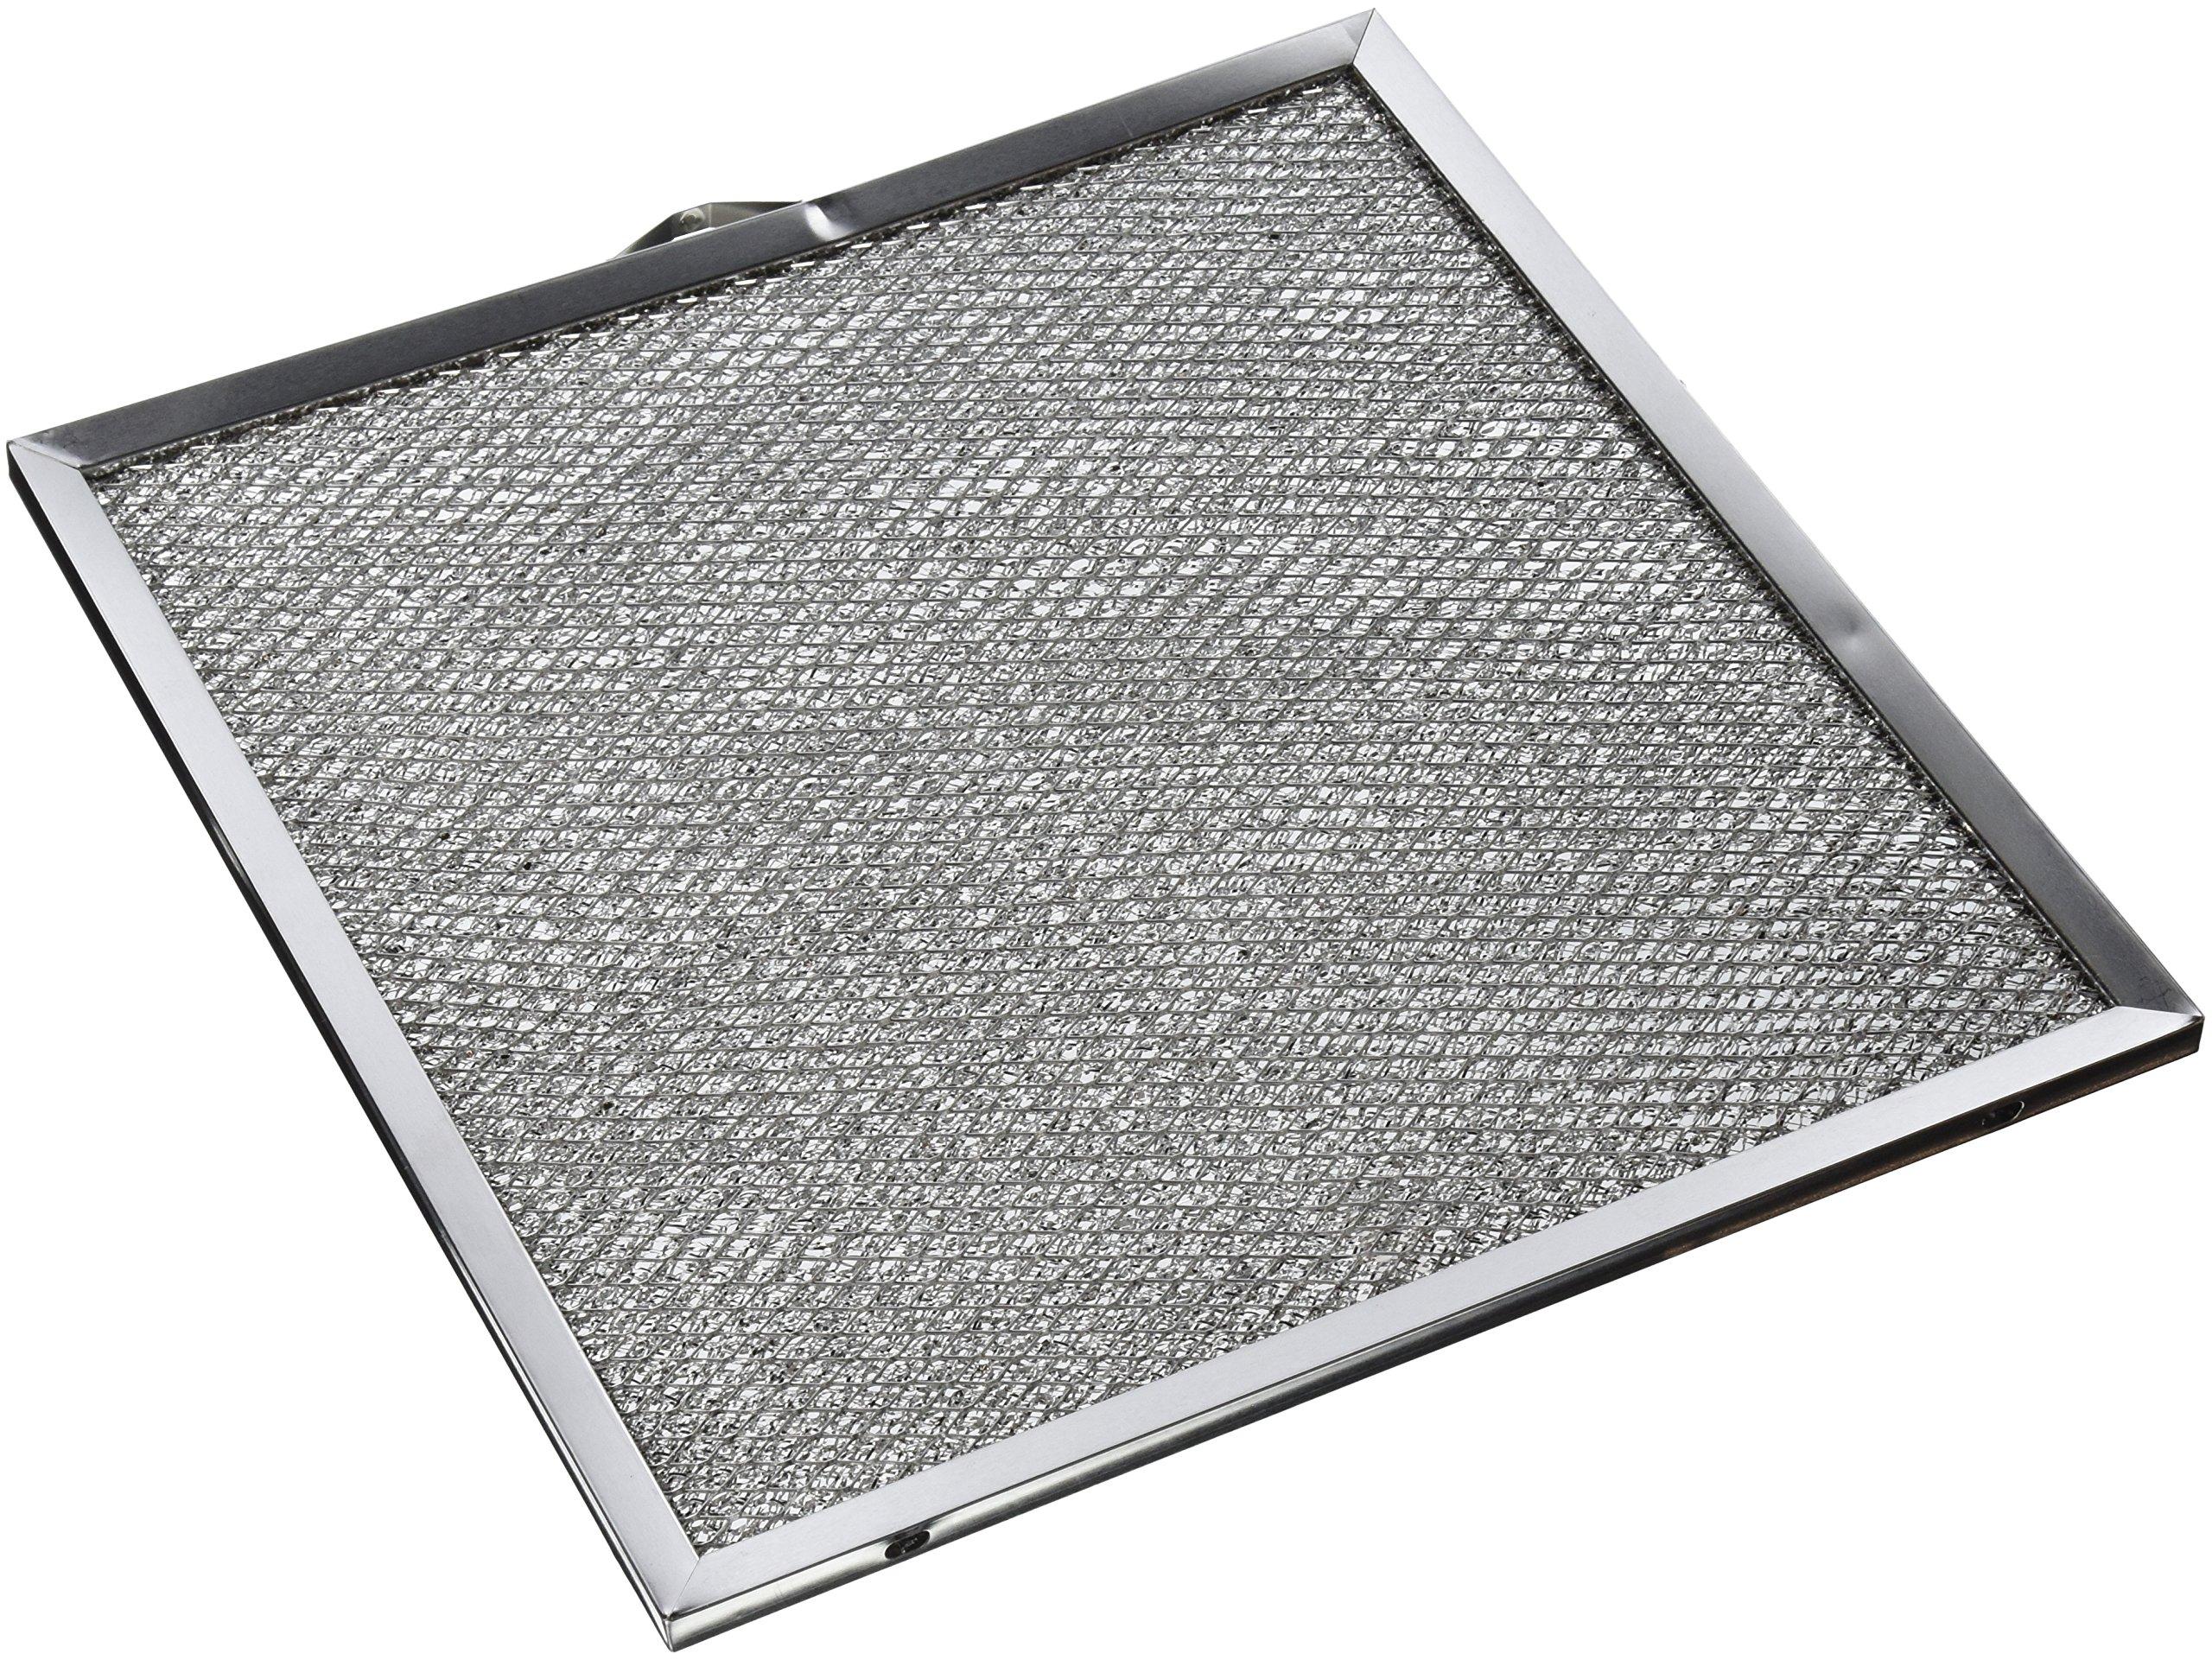 Broan S99010316 Aluminum Filter